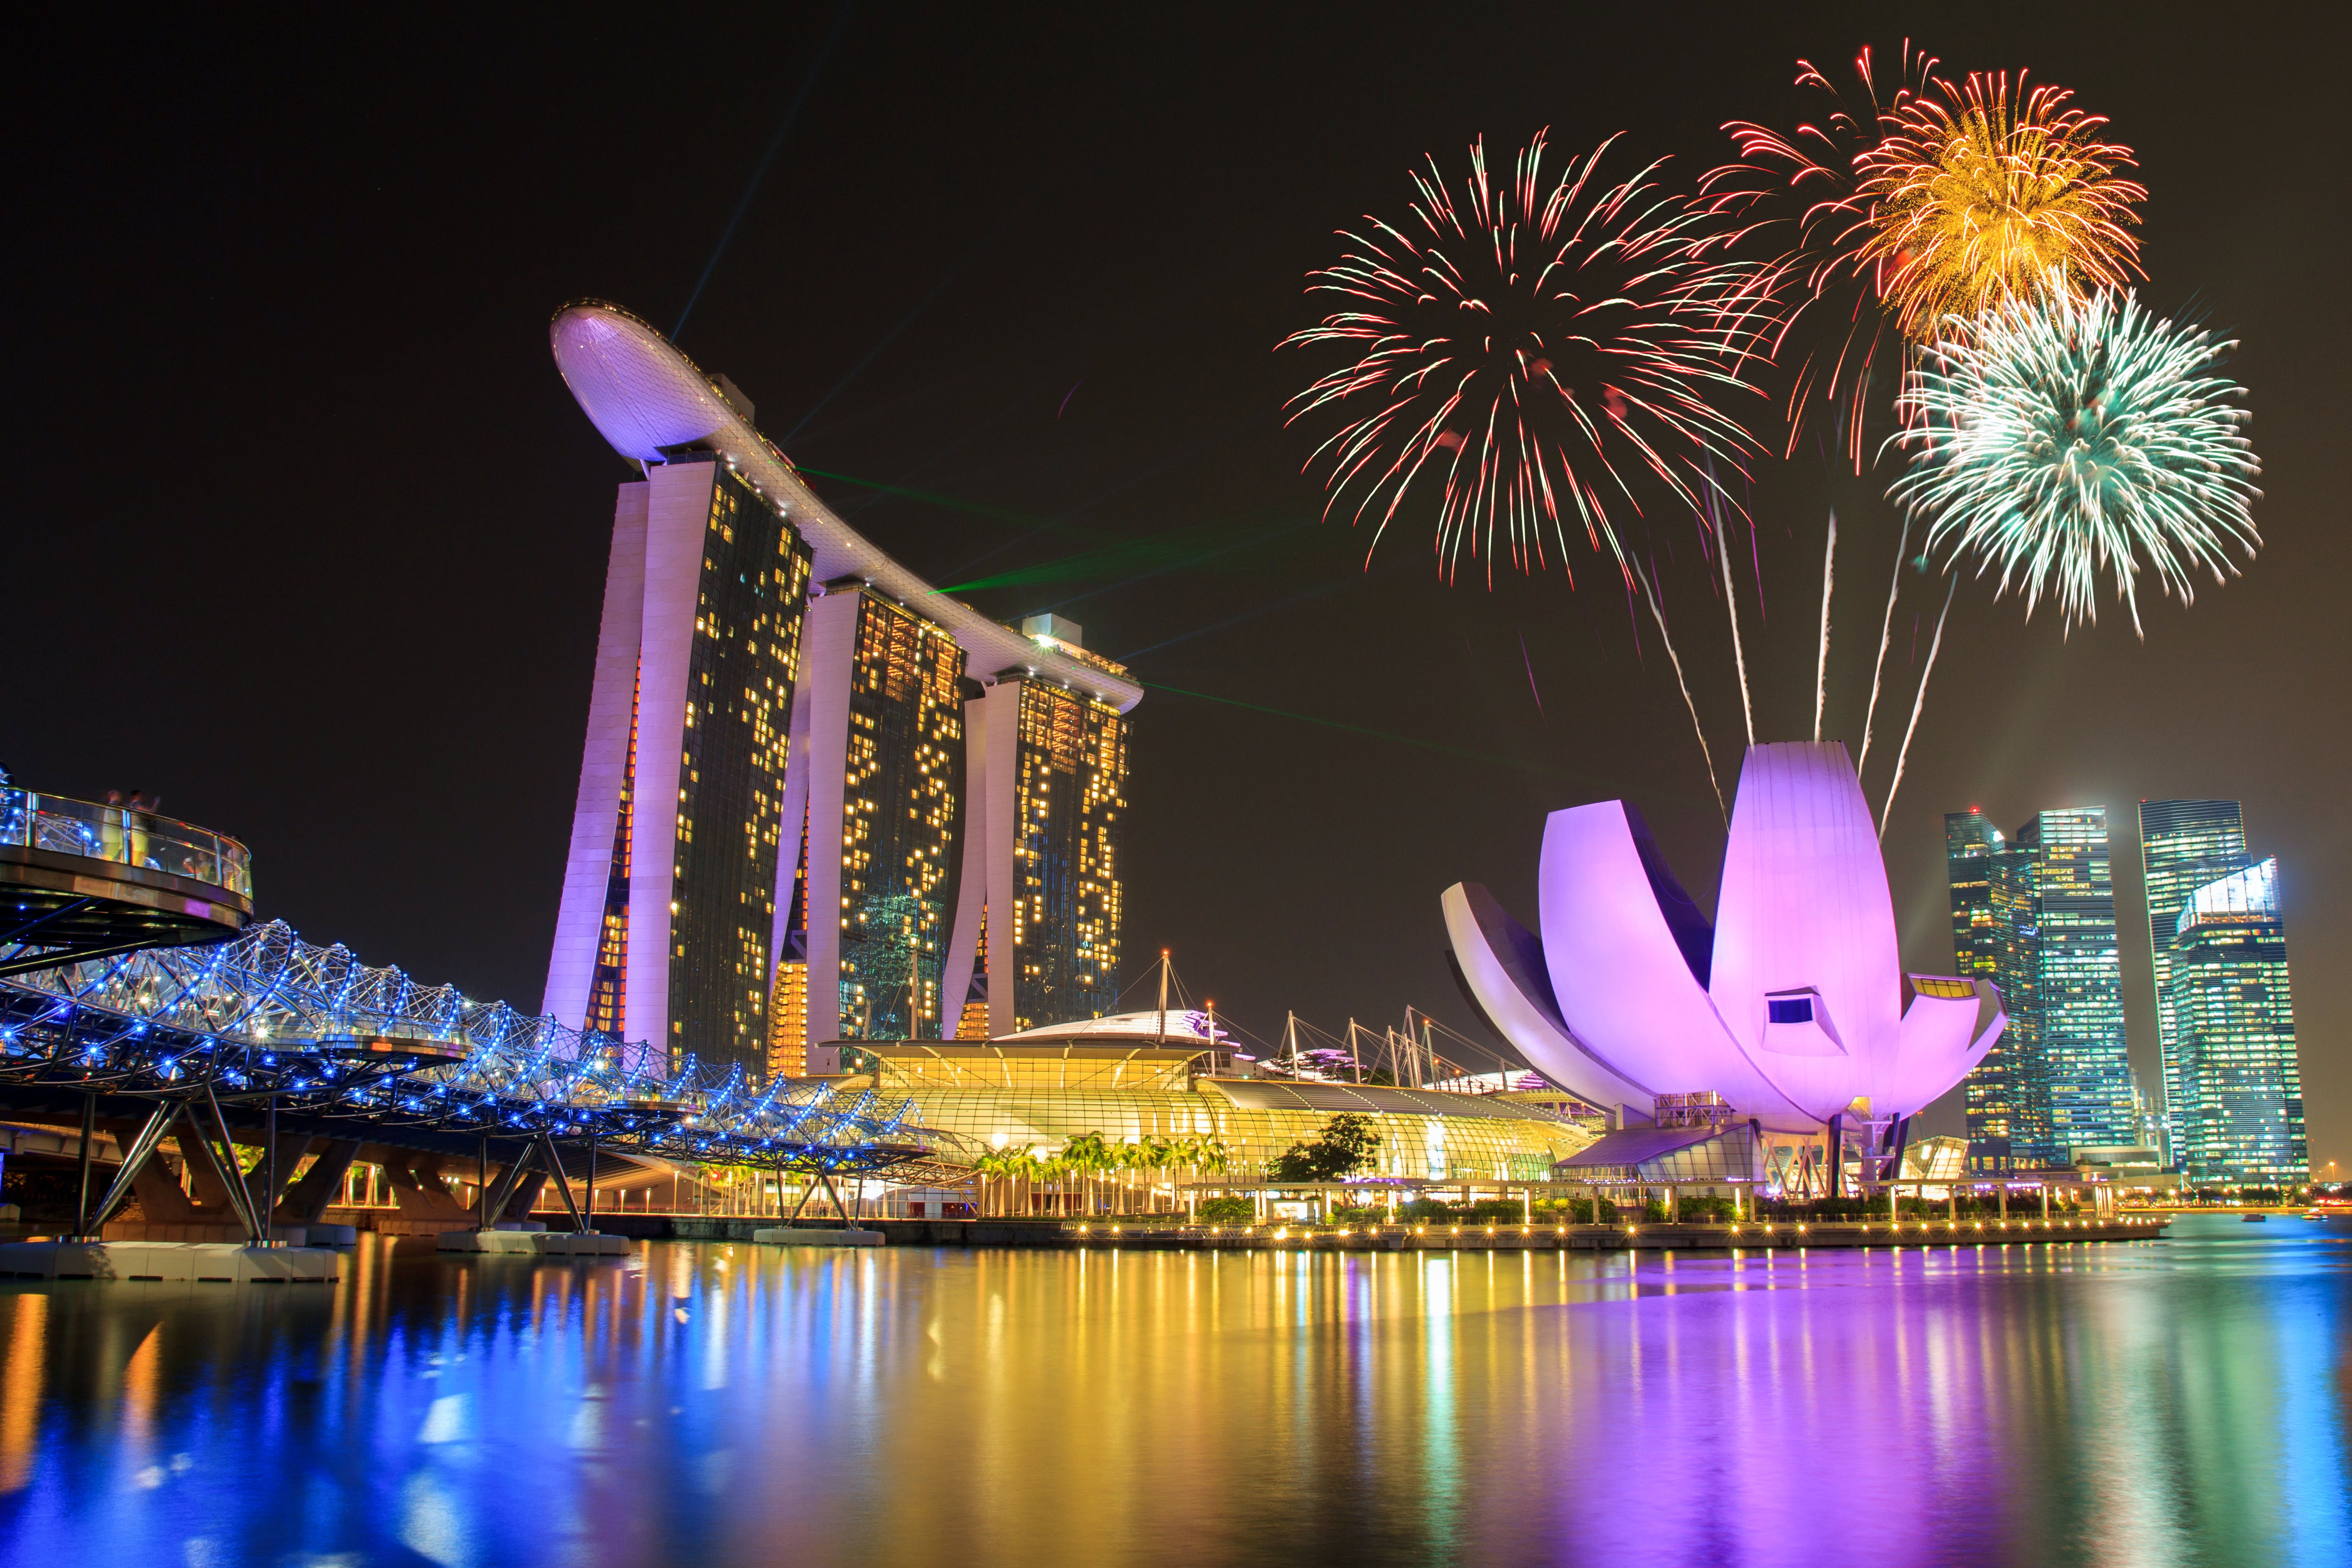 Silvester In Singapur Malakka Kuala Lumpur In Malaysia Saison